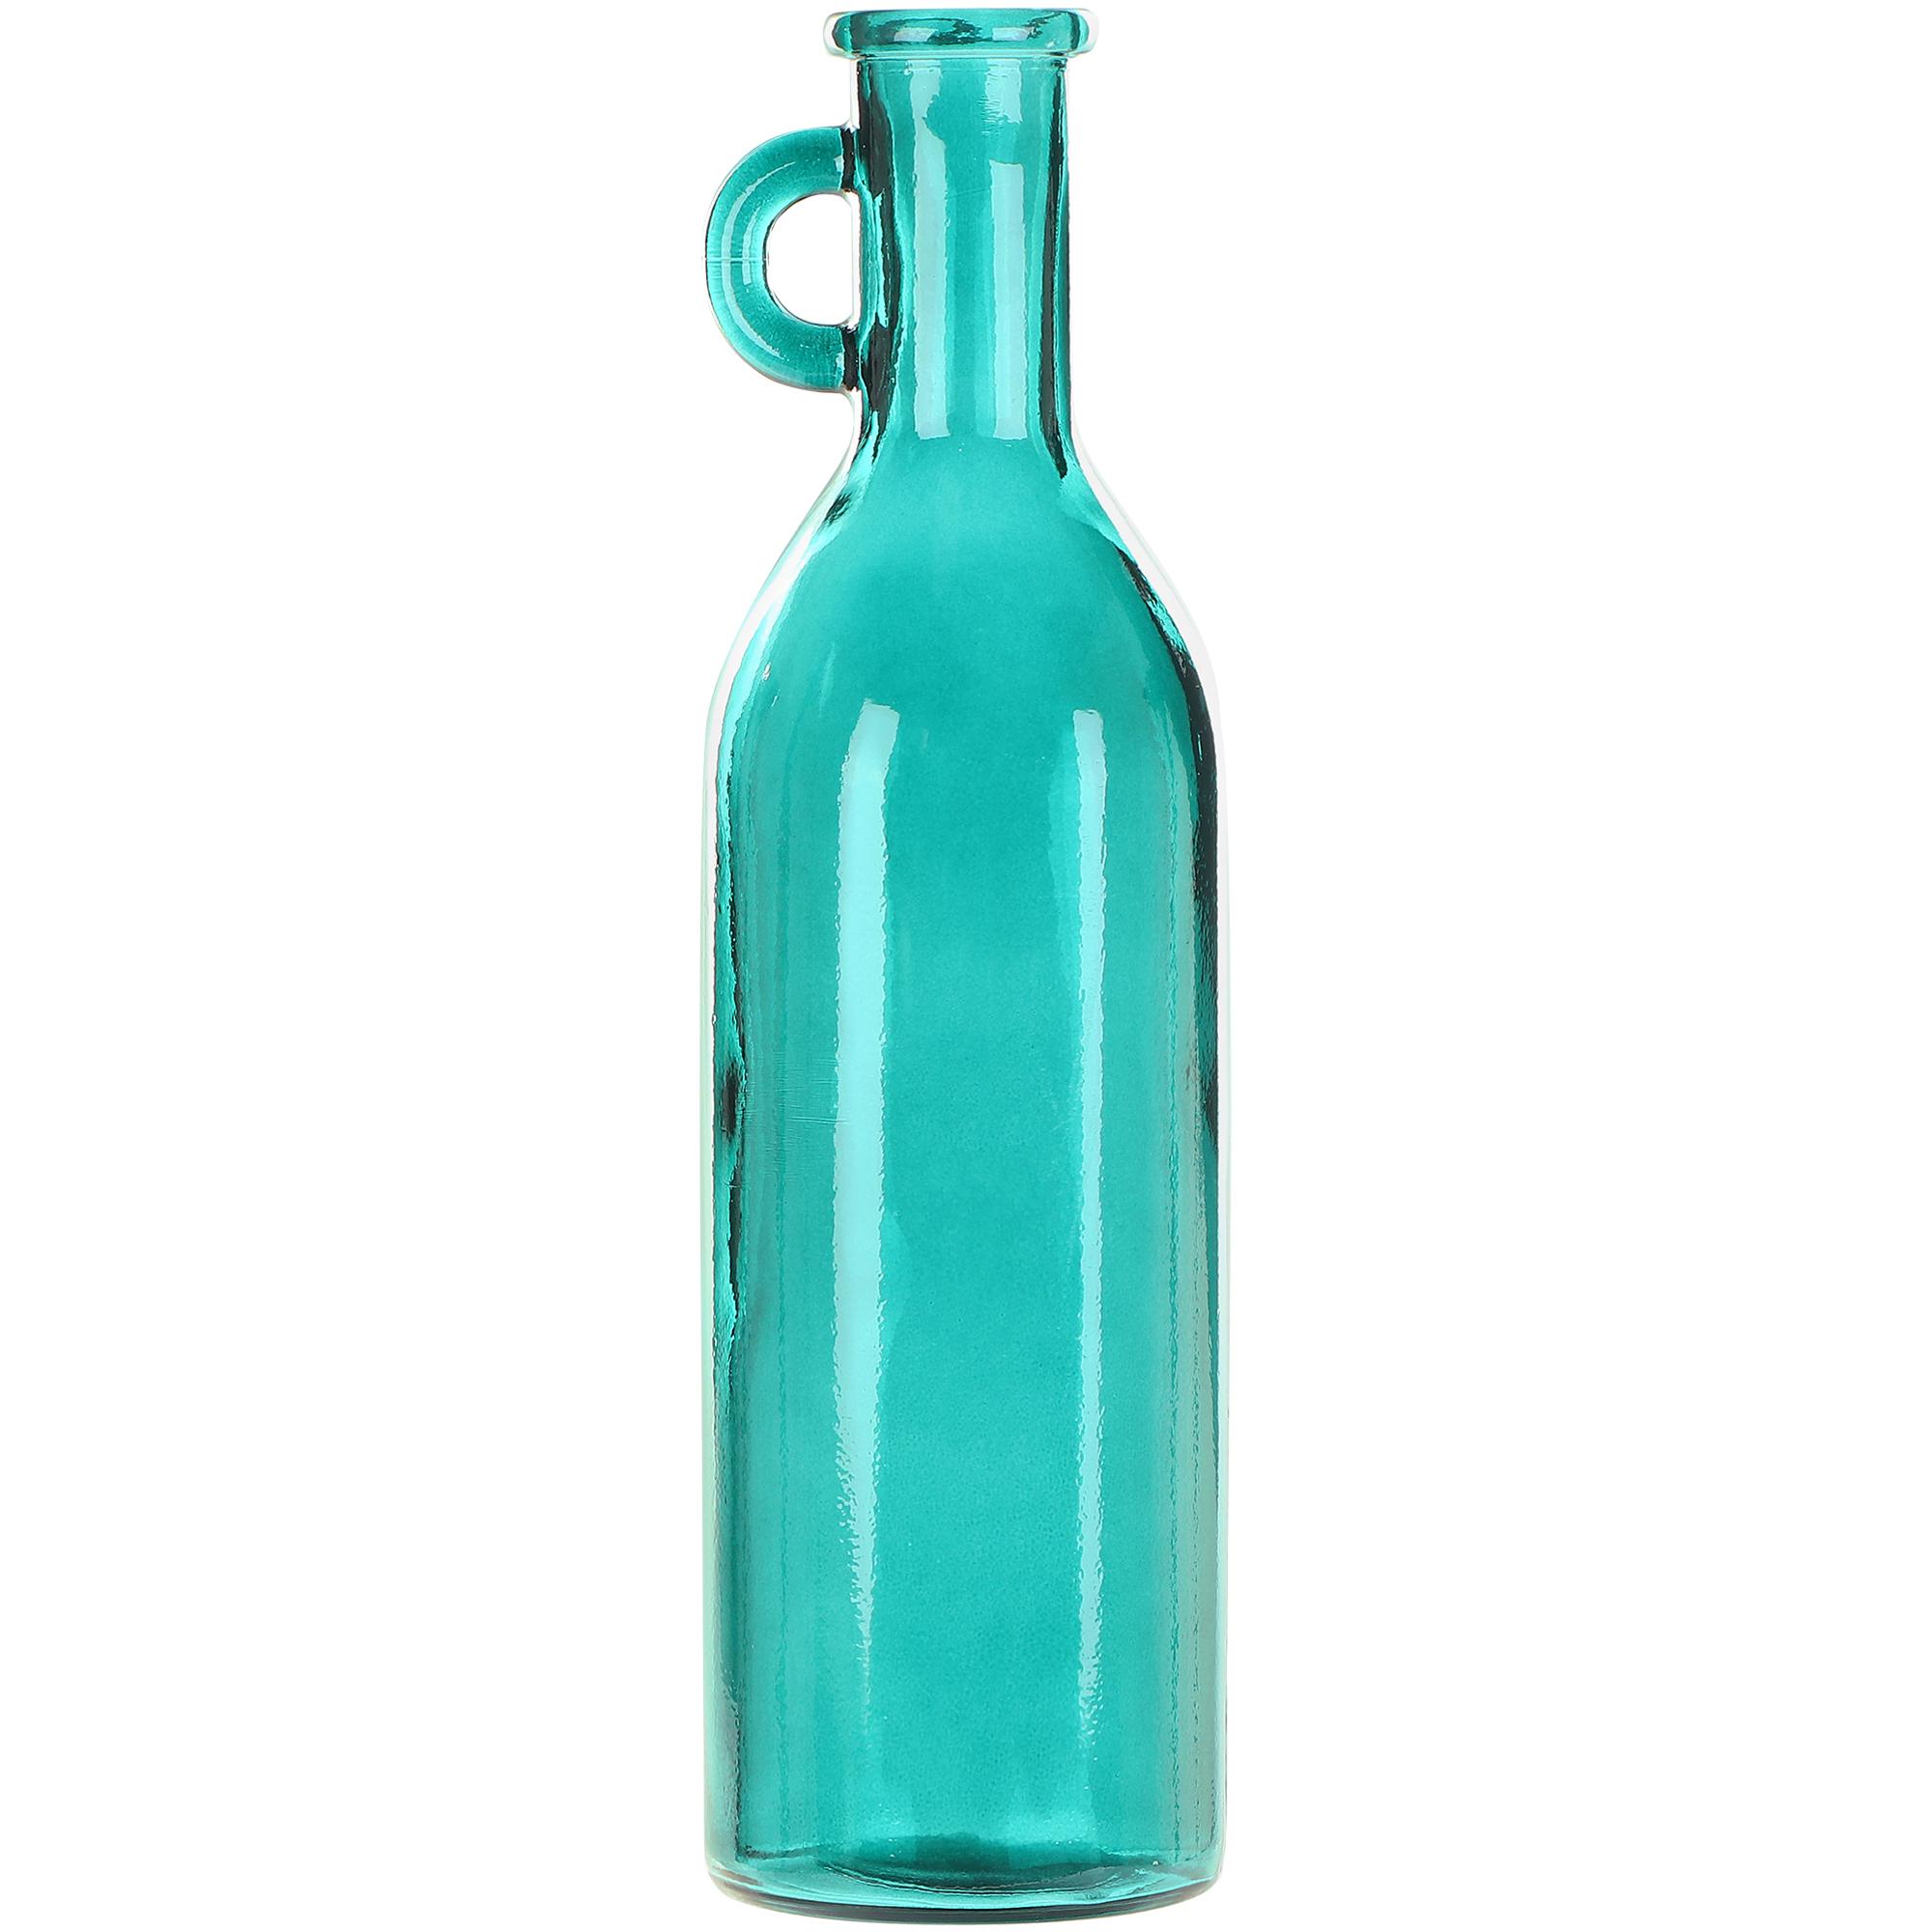 Ваза декоративная Kersten, 14х14х50 см ваза декоративная kersten 18х18х80 см